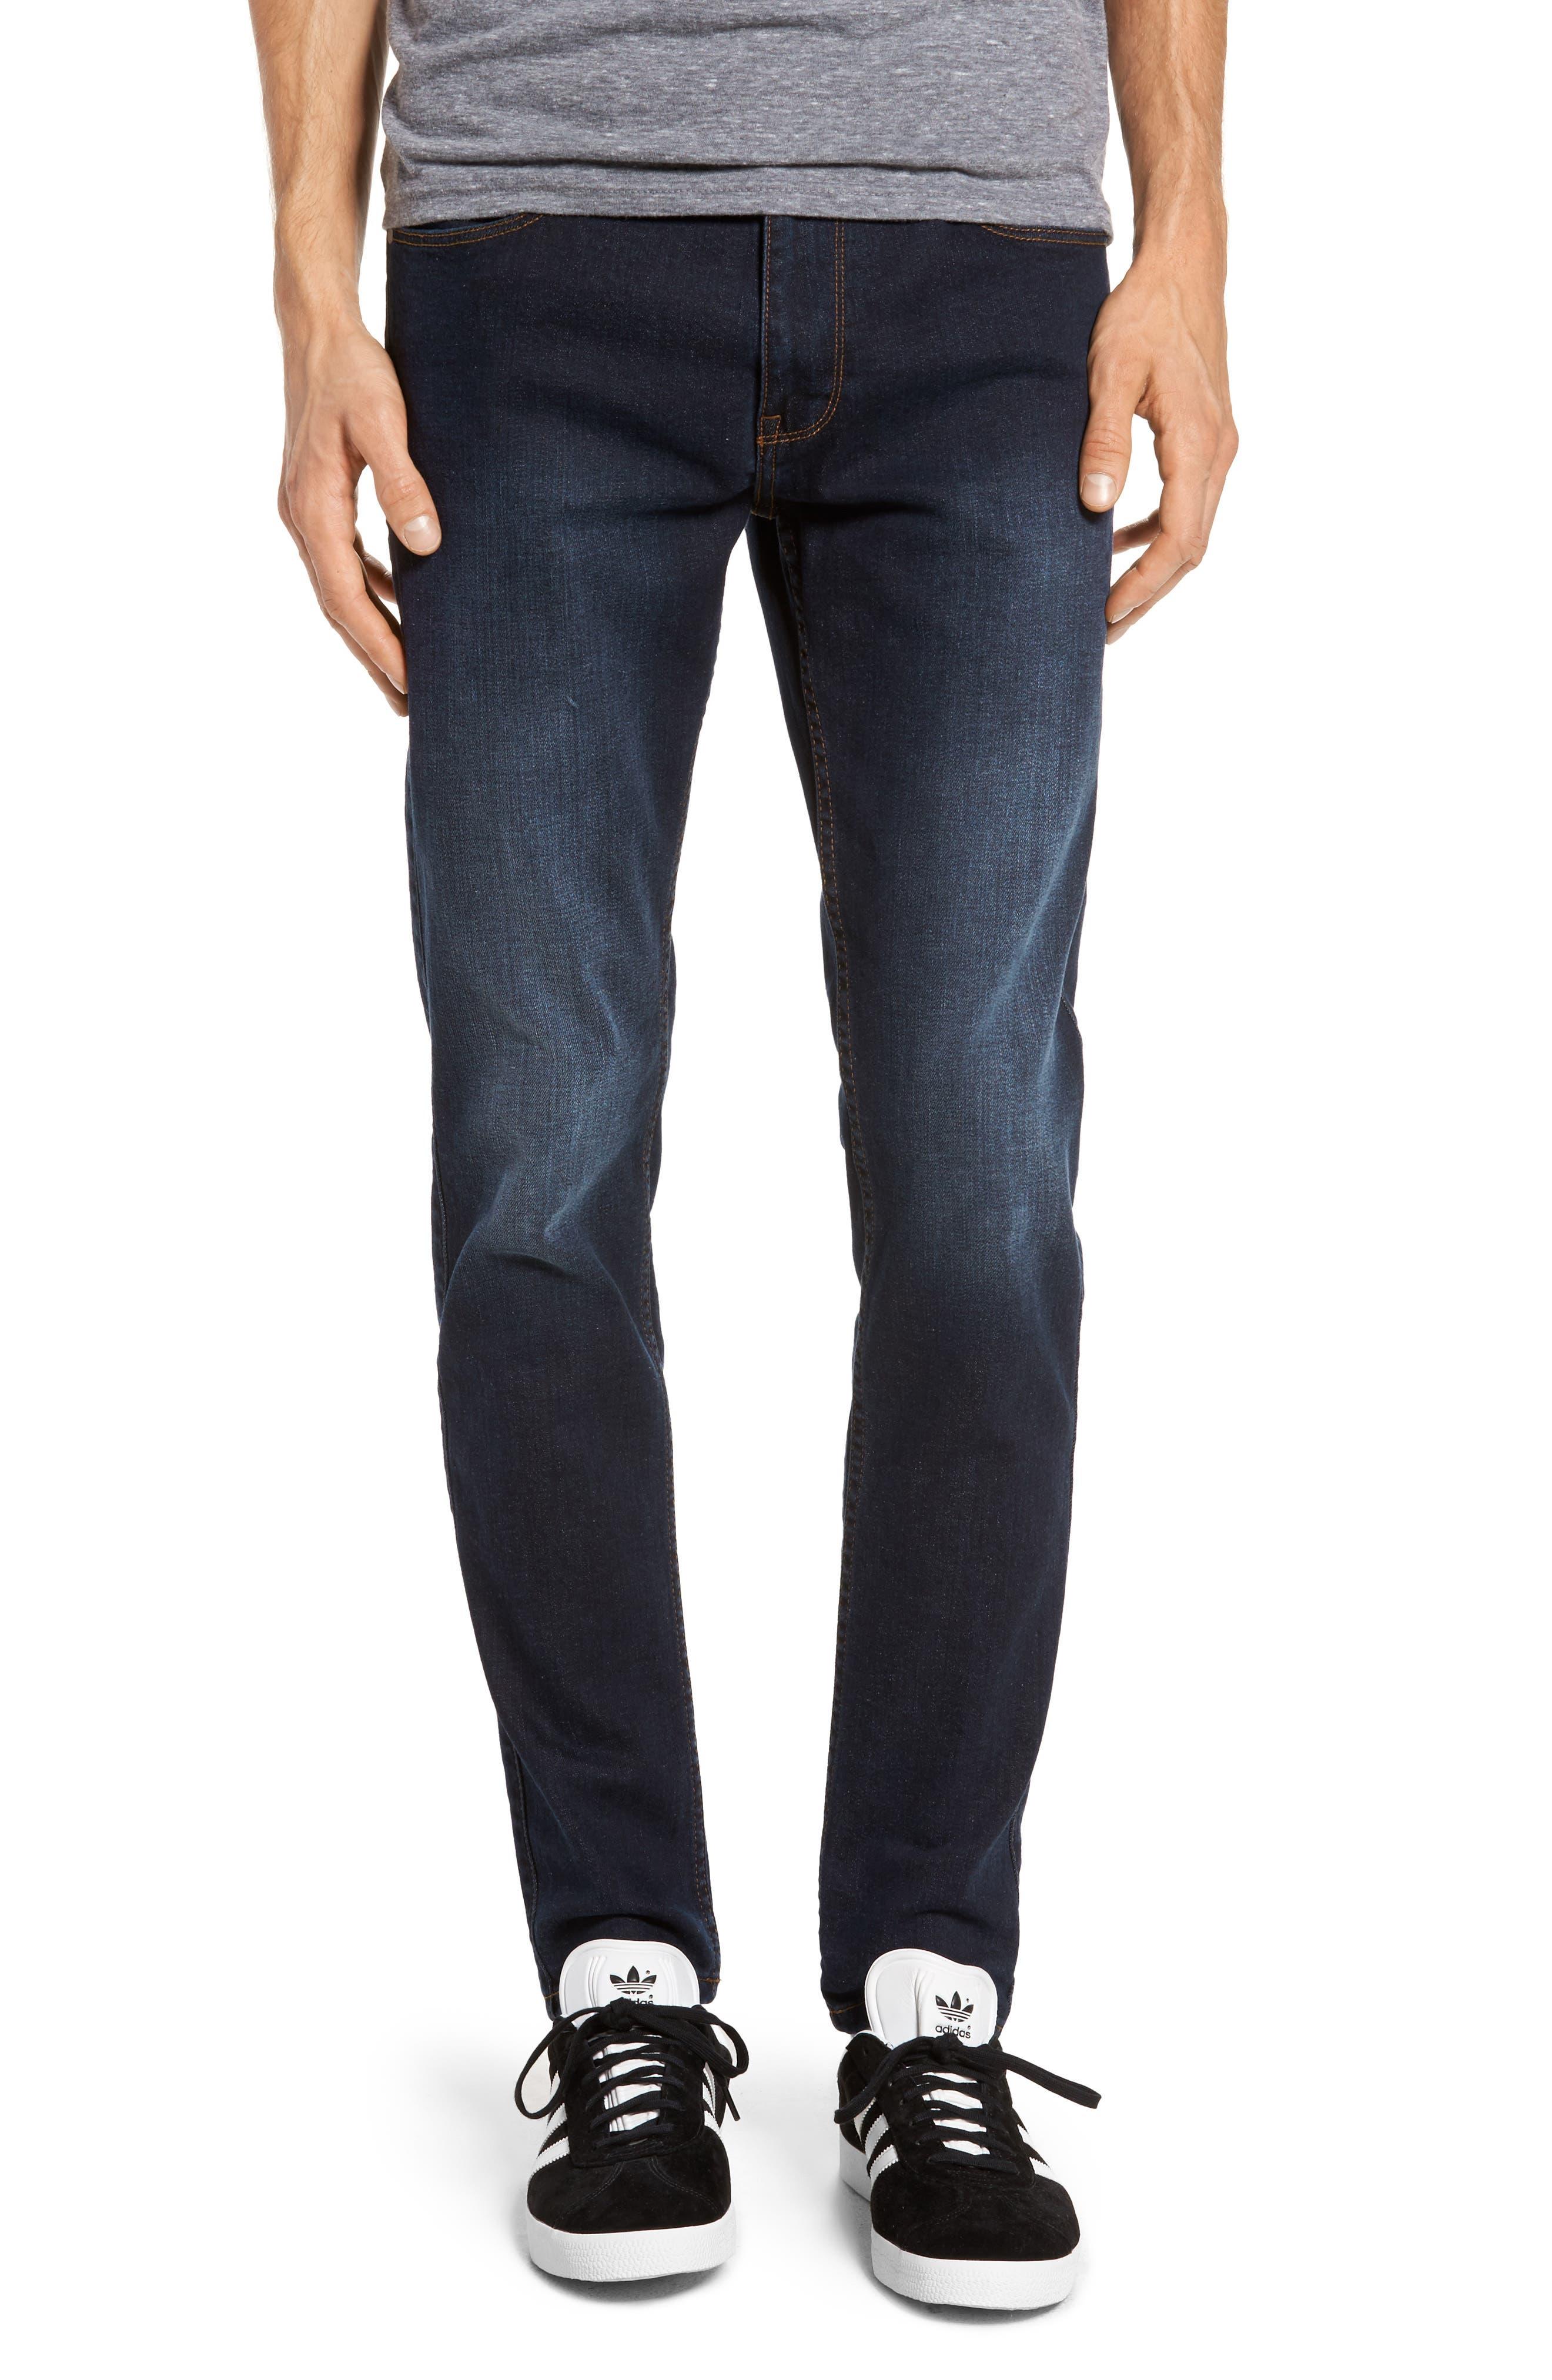 Clark Sim Straight Fit Jeans,                         Main,                         color, Worn Dark Blue